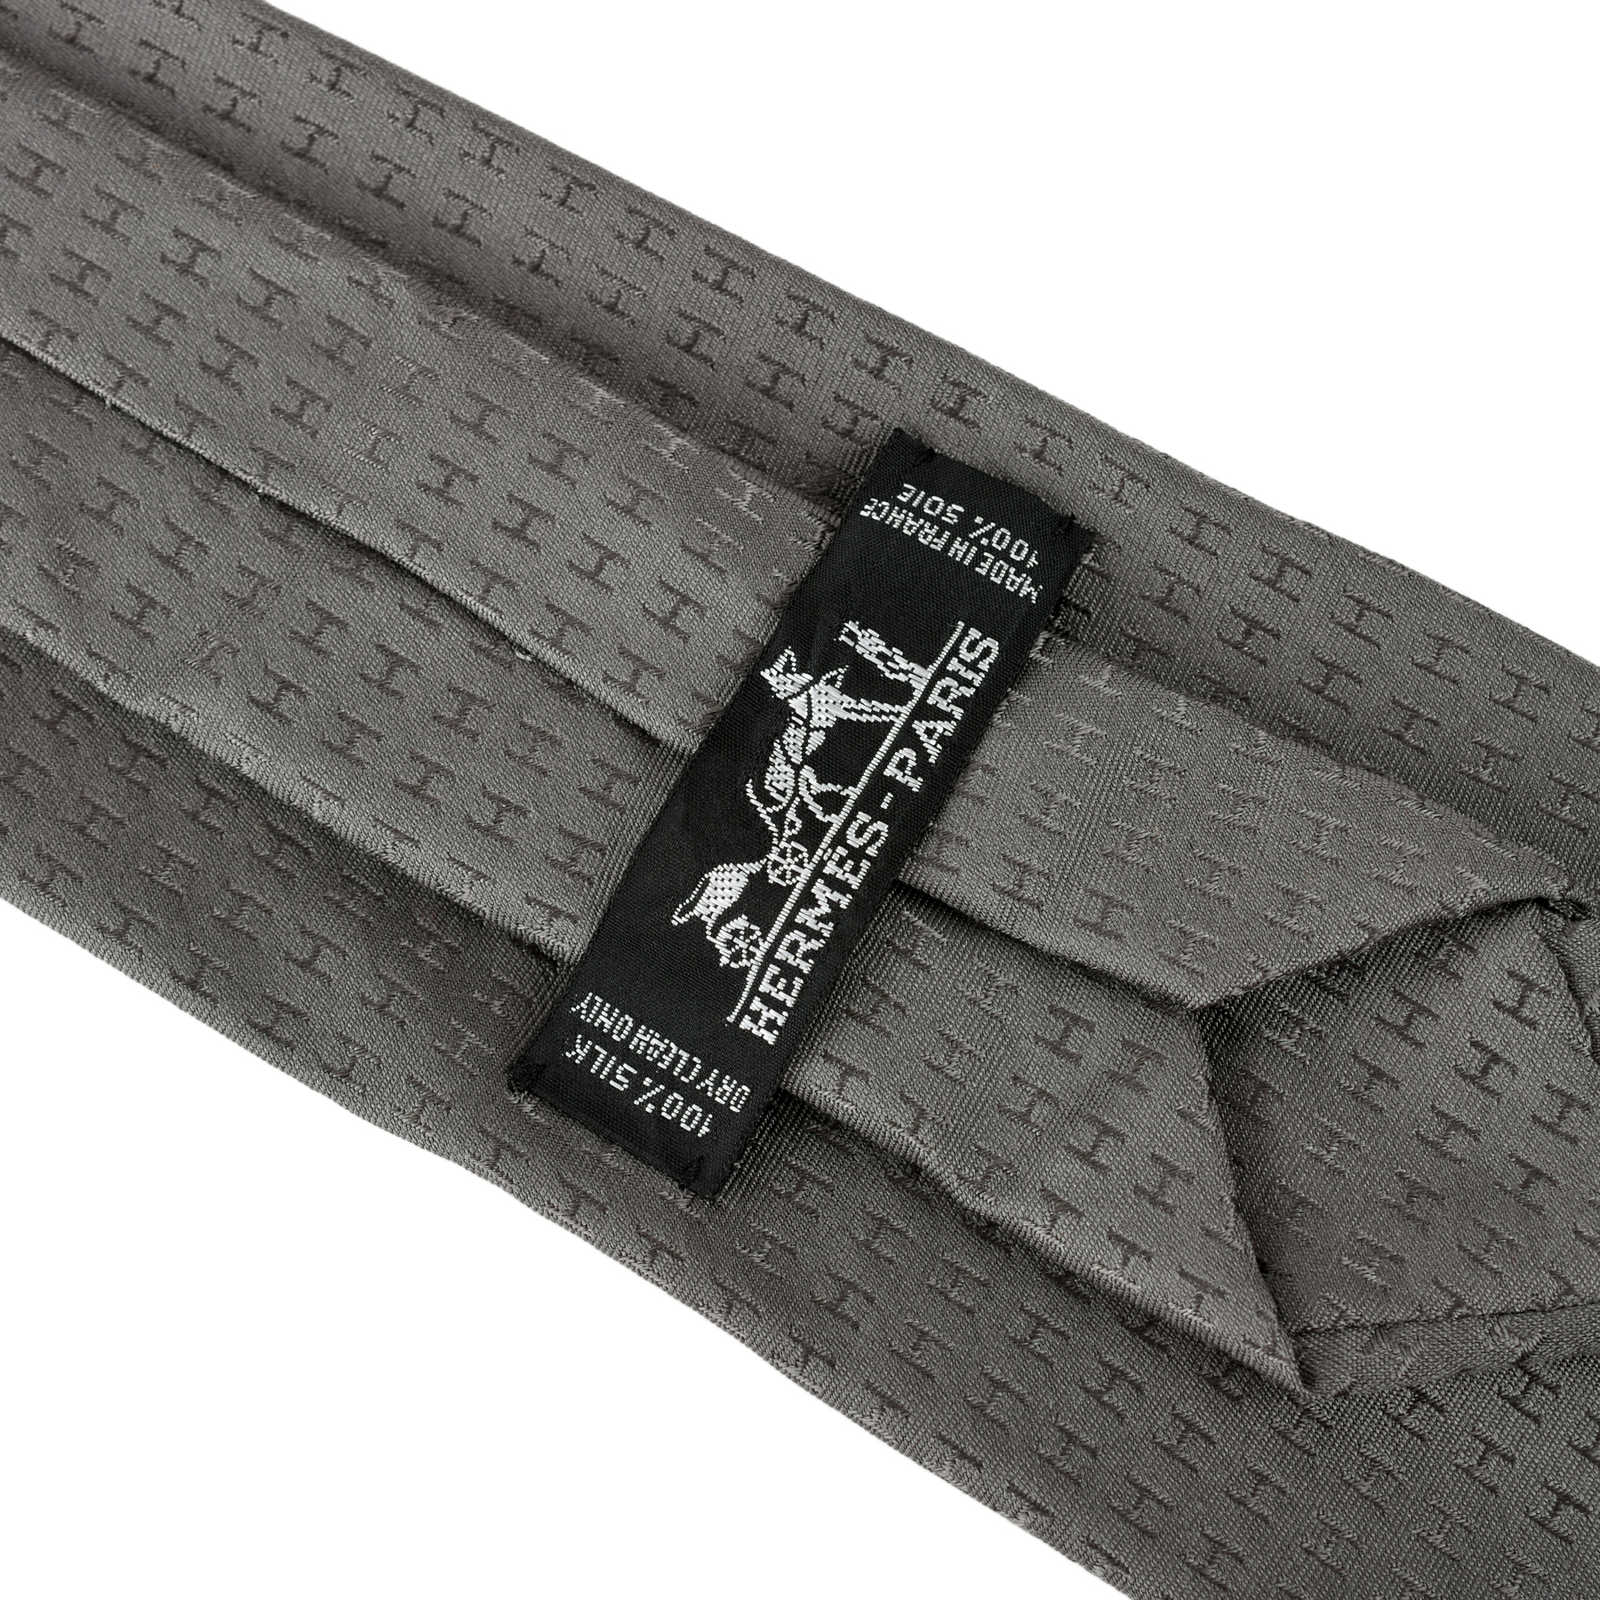 3aa8b1213b14 ... Authentic Second Hand Hermès Faconnee H Jacquard Neck Tie  (PSS-462-00015) ...